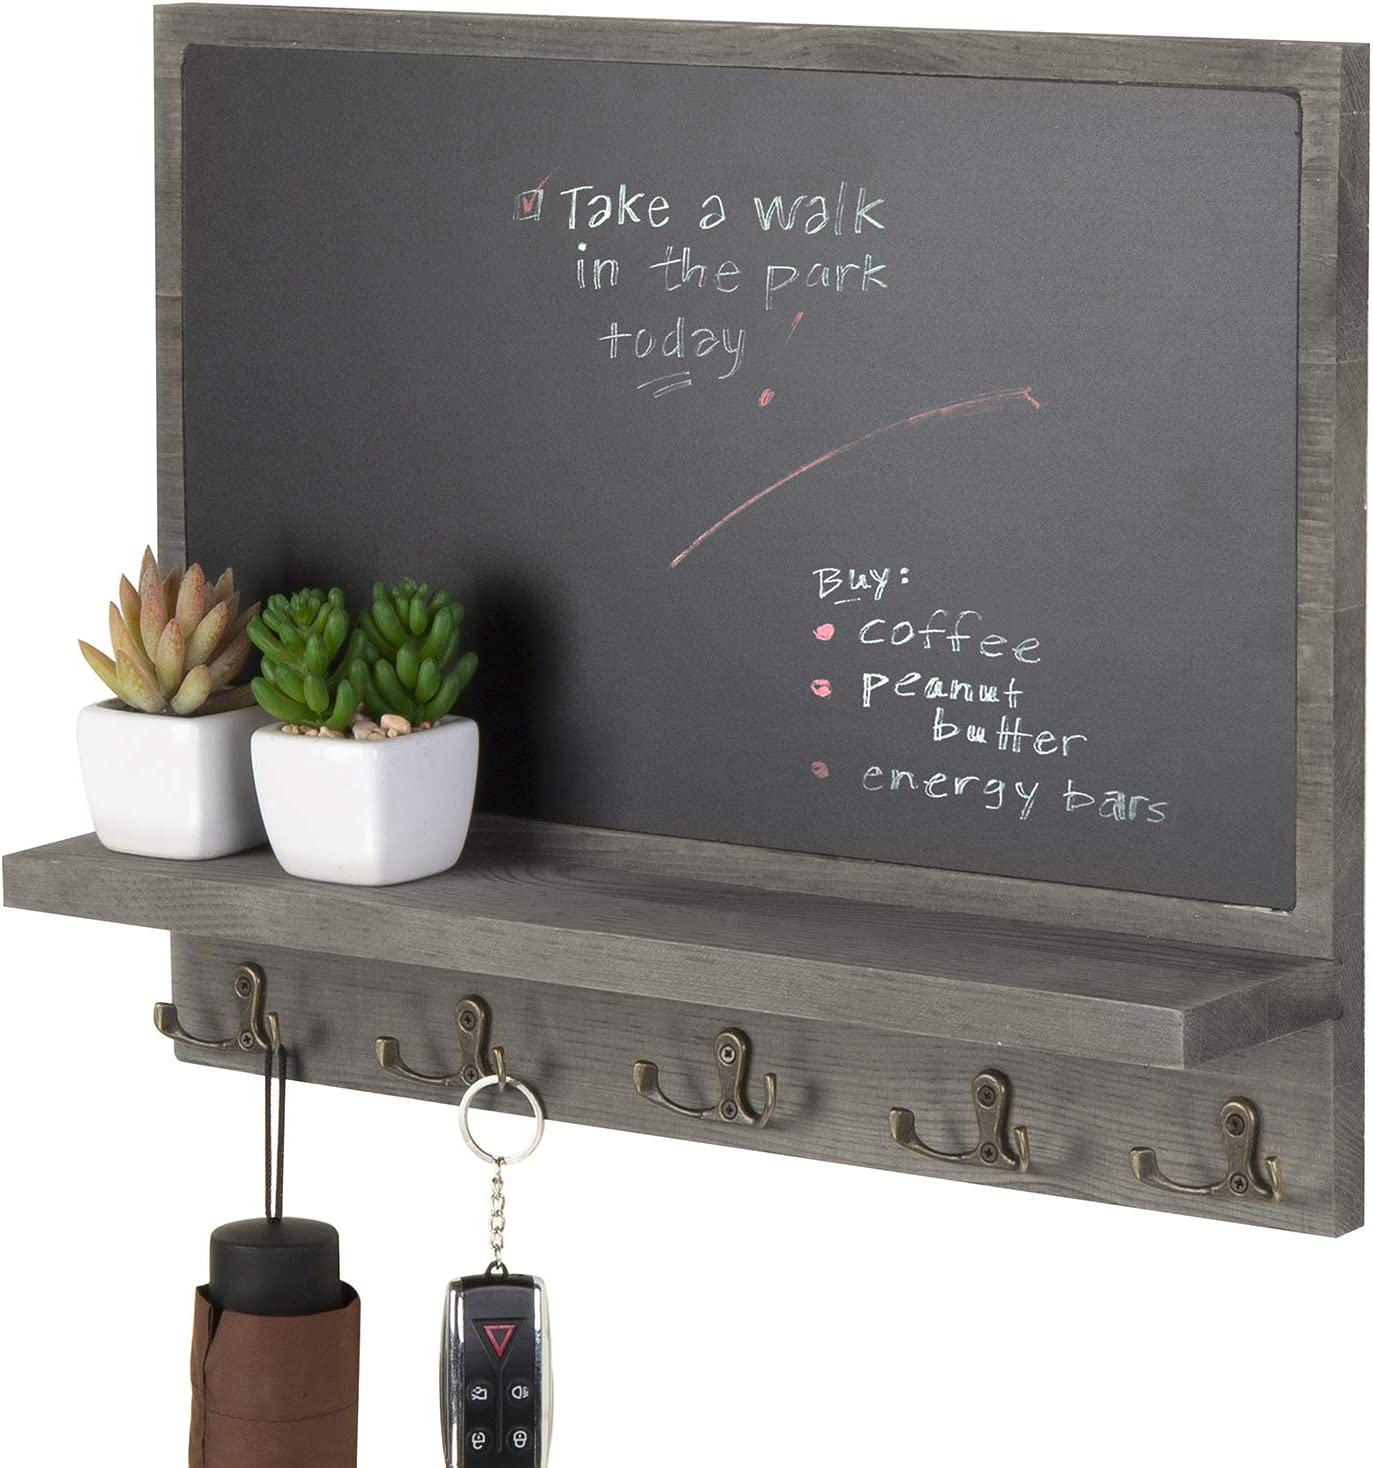 MyGift Wall-Mounted Barnwood Gray Wood Chalkboard Wall Decor with Display Ledge and 10 Key Hooks